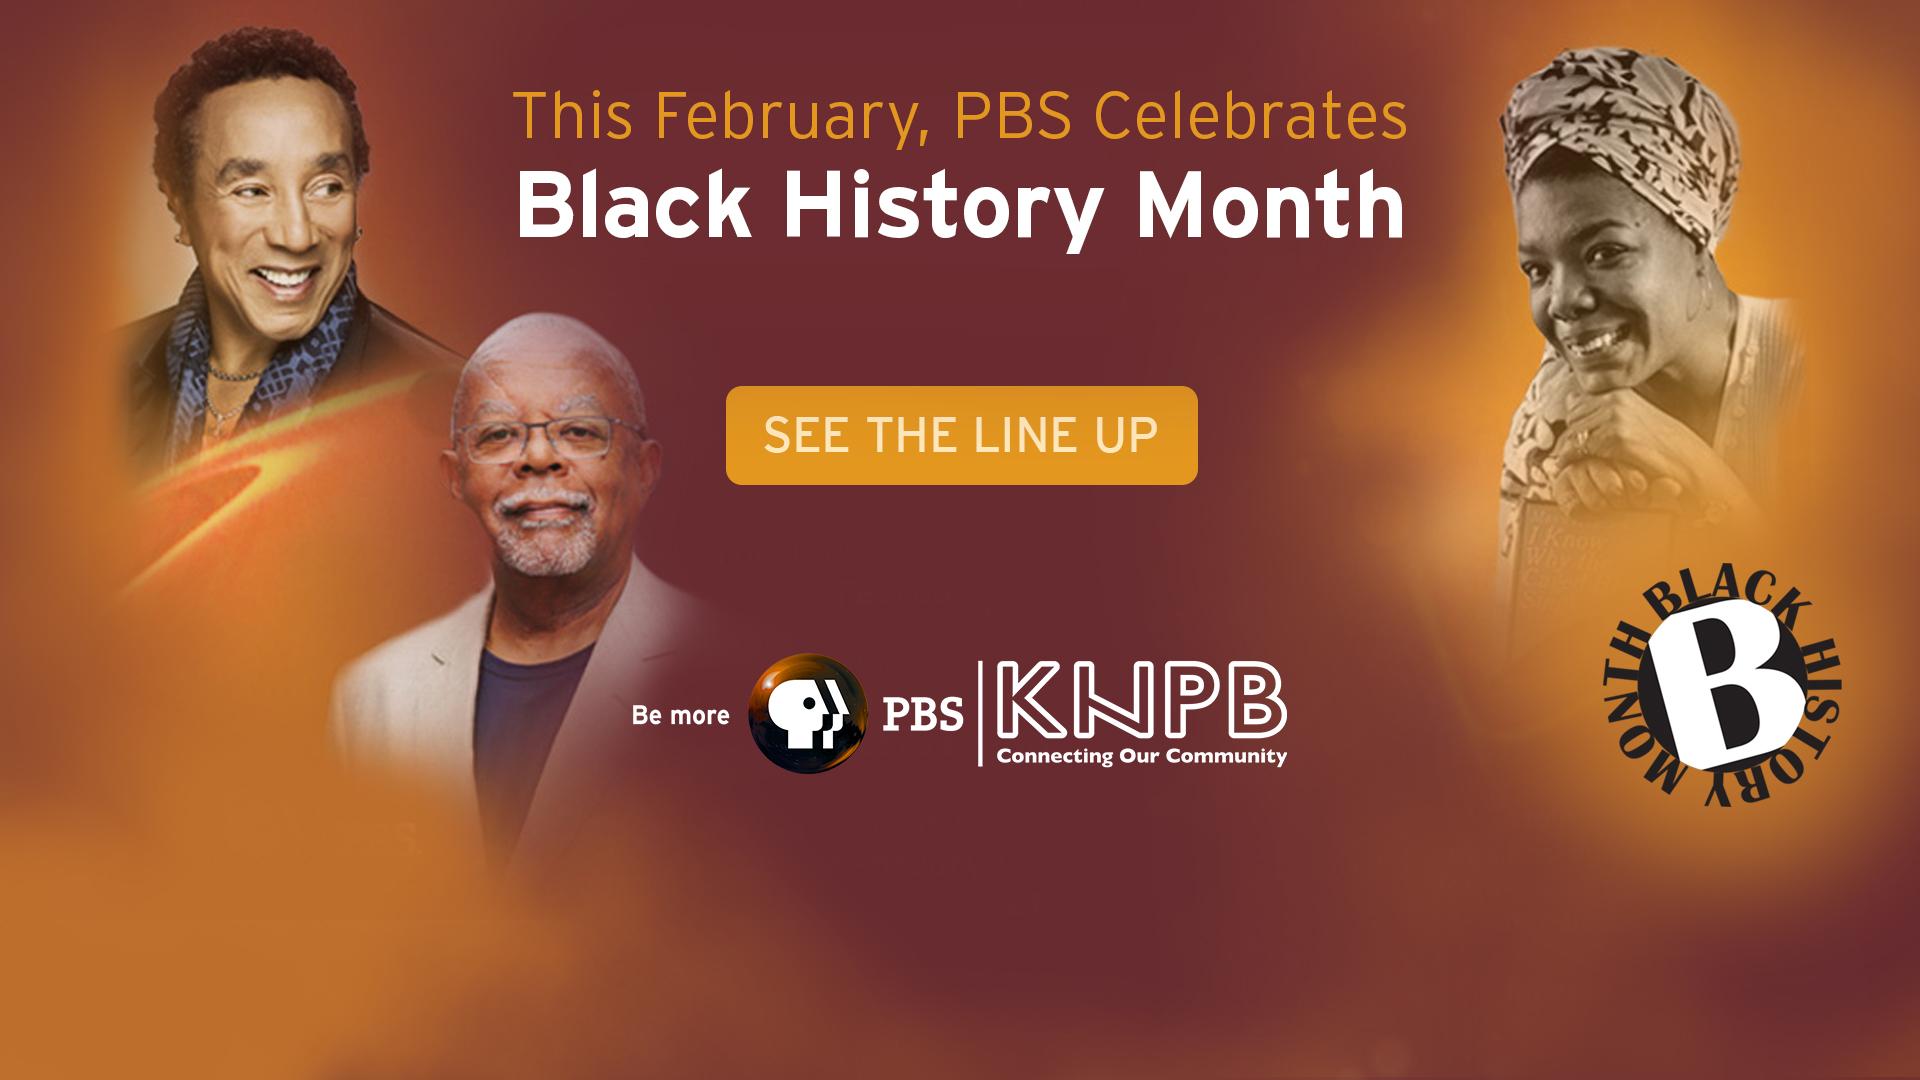 KNPB Celebrates Black History Month